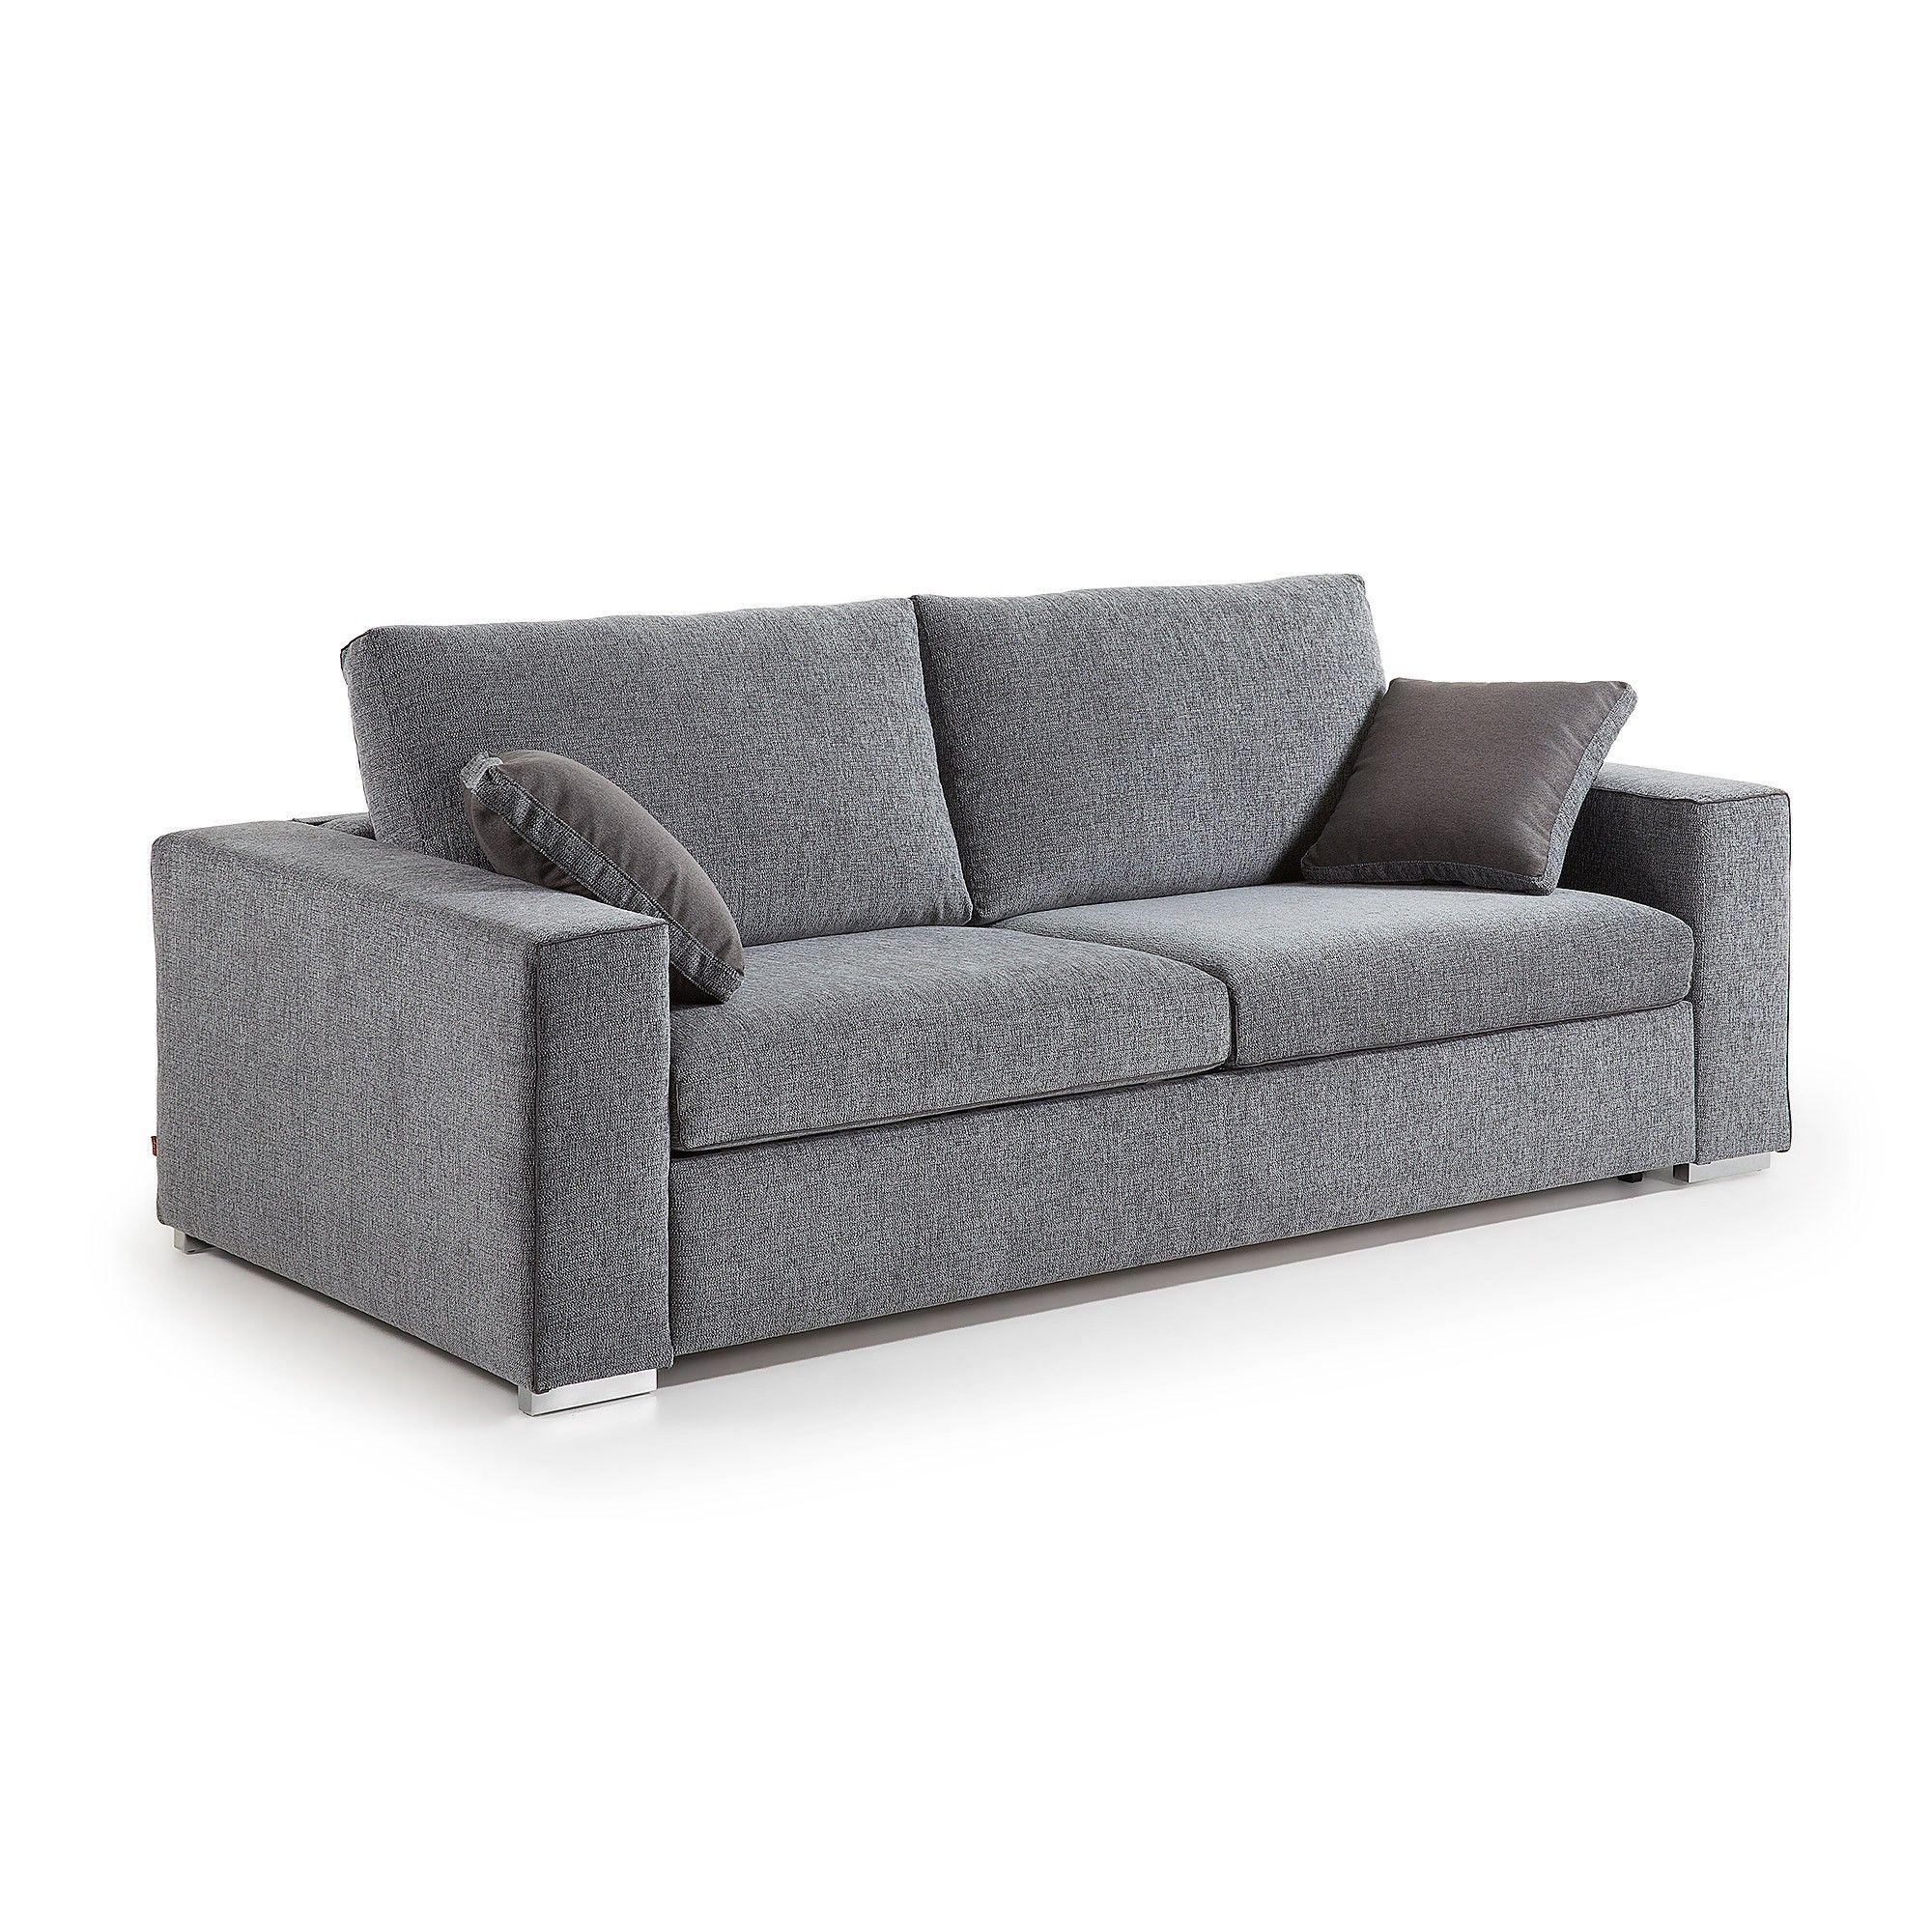 Canapé Convertible Big 180, Gris In 2020 | Ikea Living Room ... intérieur Canape Convertible Original